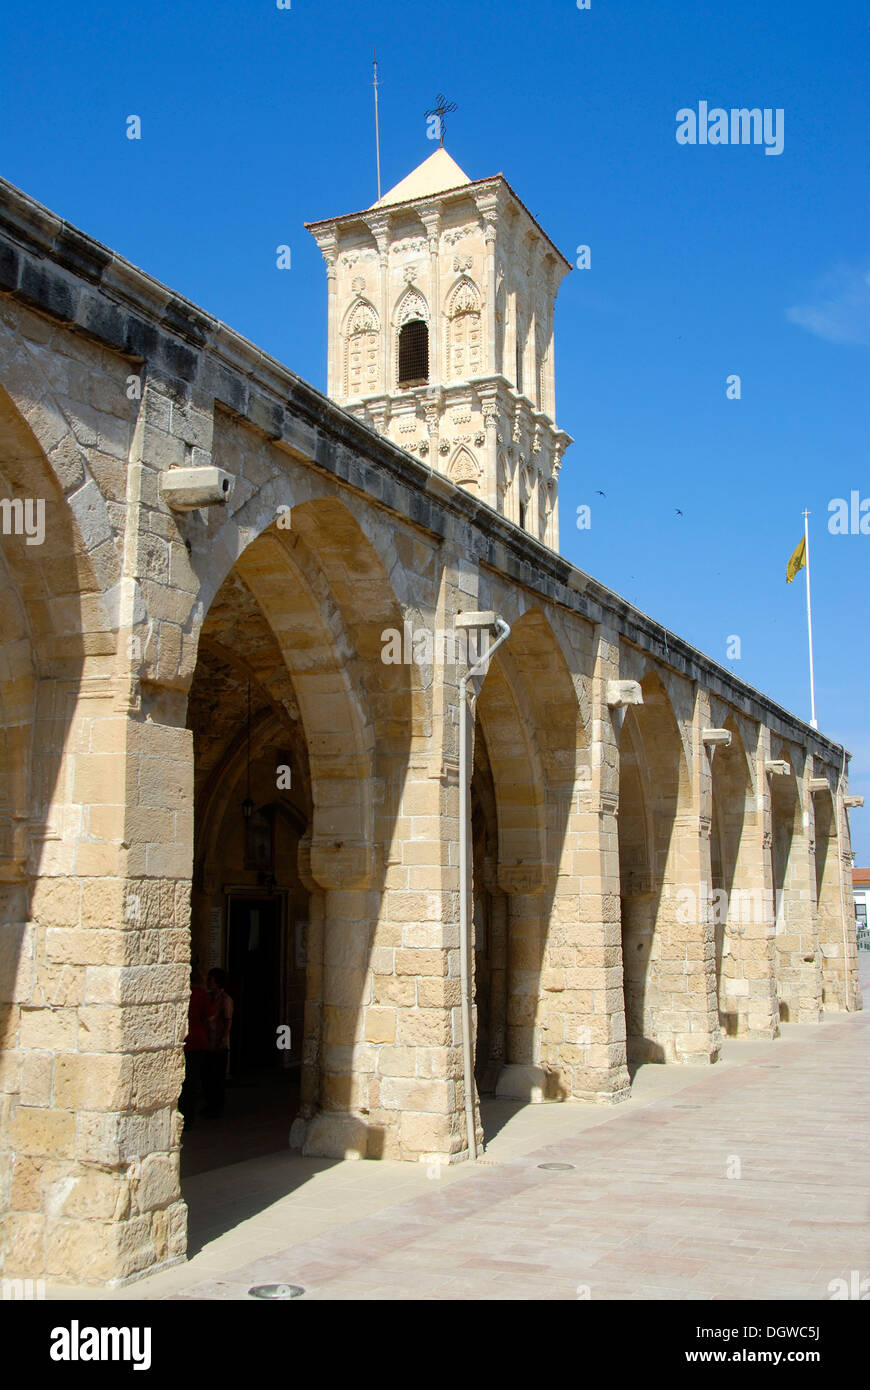 Greek Orthodox Christianity, Lazarus Church, Agios Lazaros Church, arches and tower, Larnaca, Southern Cyprus - Stock Image